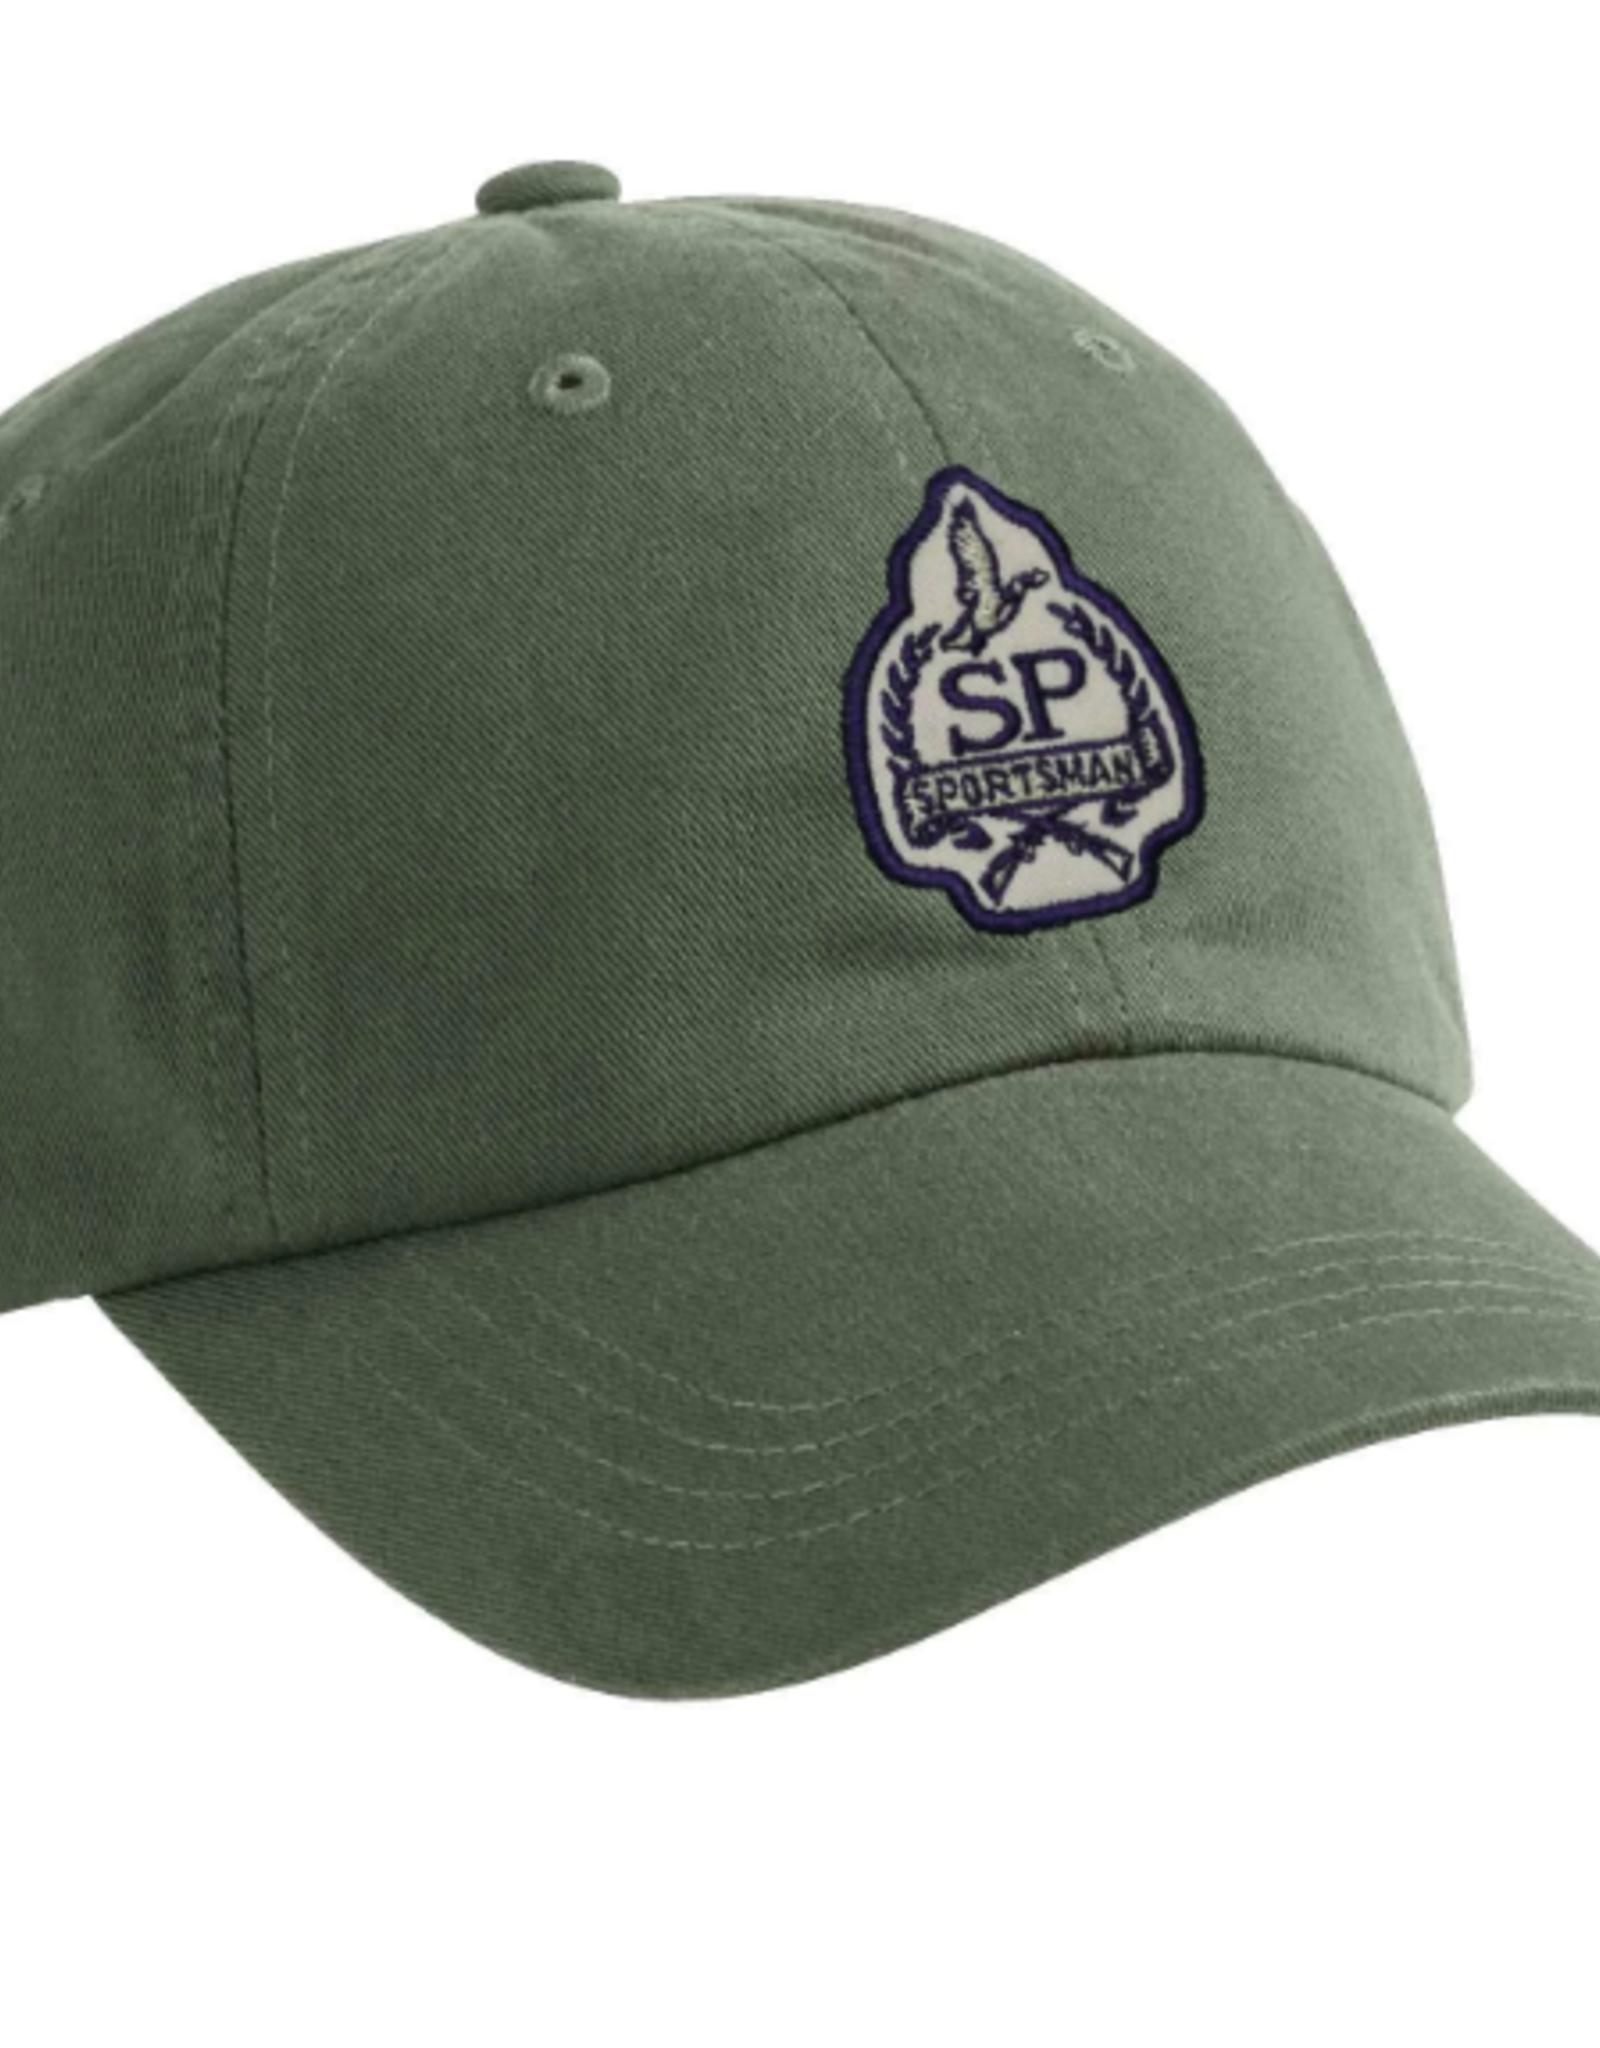 Southern Proper Proper Sportsman Hat